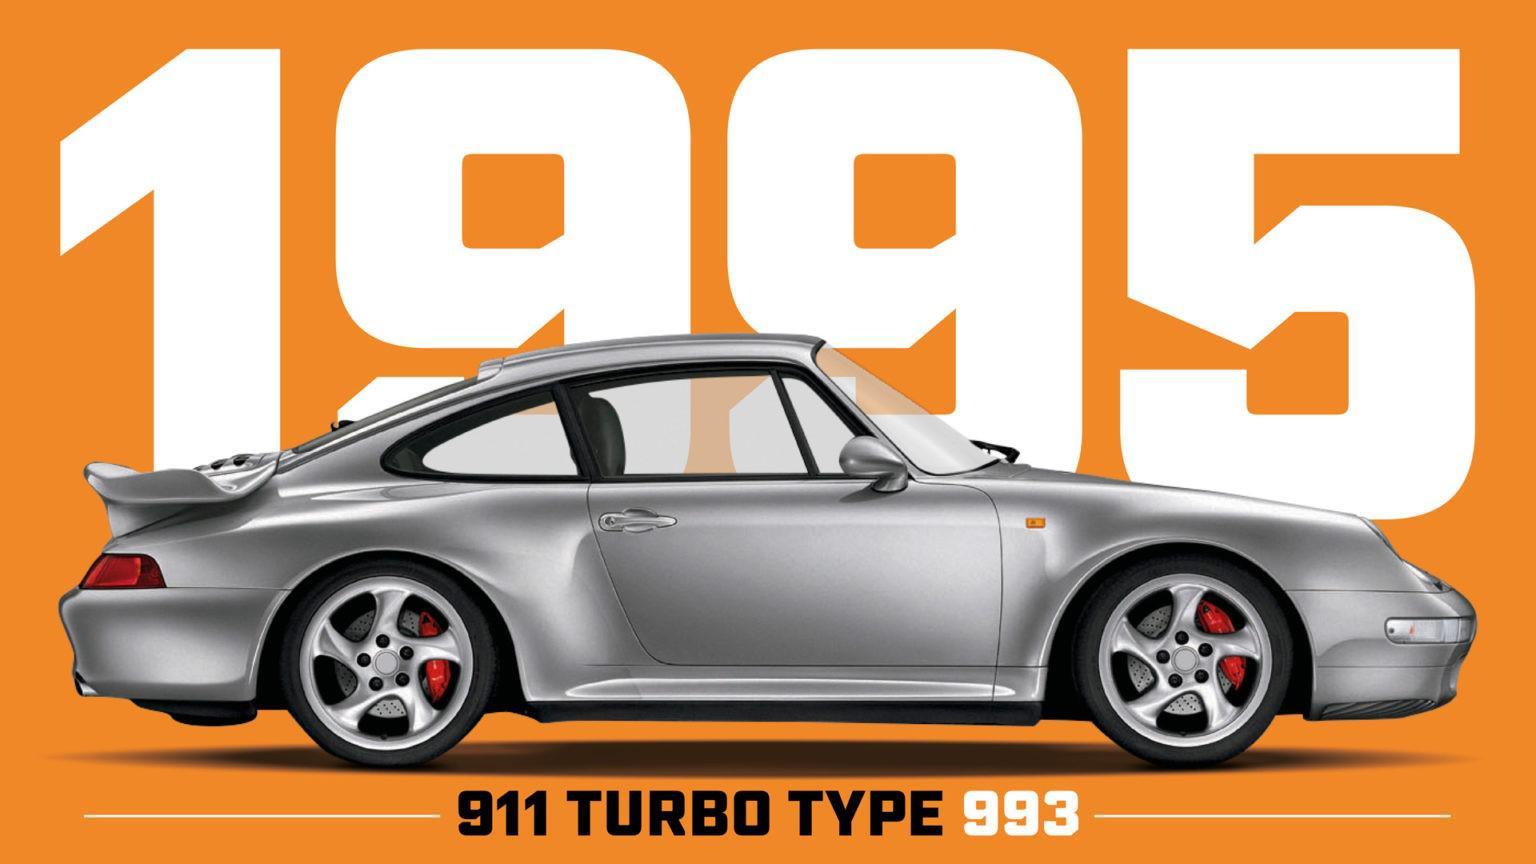 la-saga-porsche-911-turbo-le-guide-d-achat-1349-3.jpg